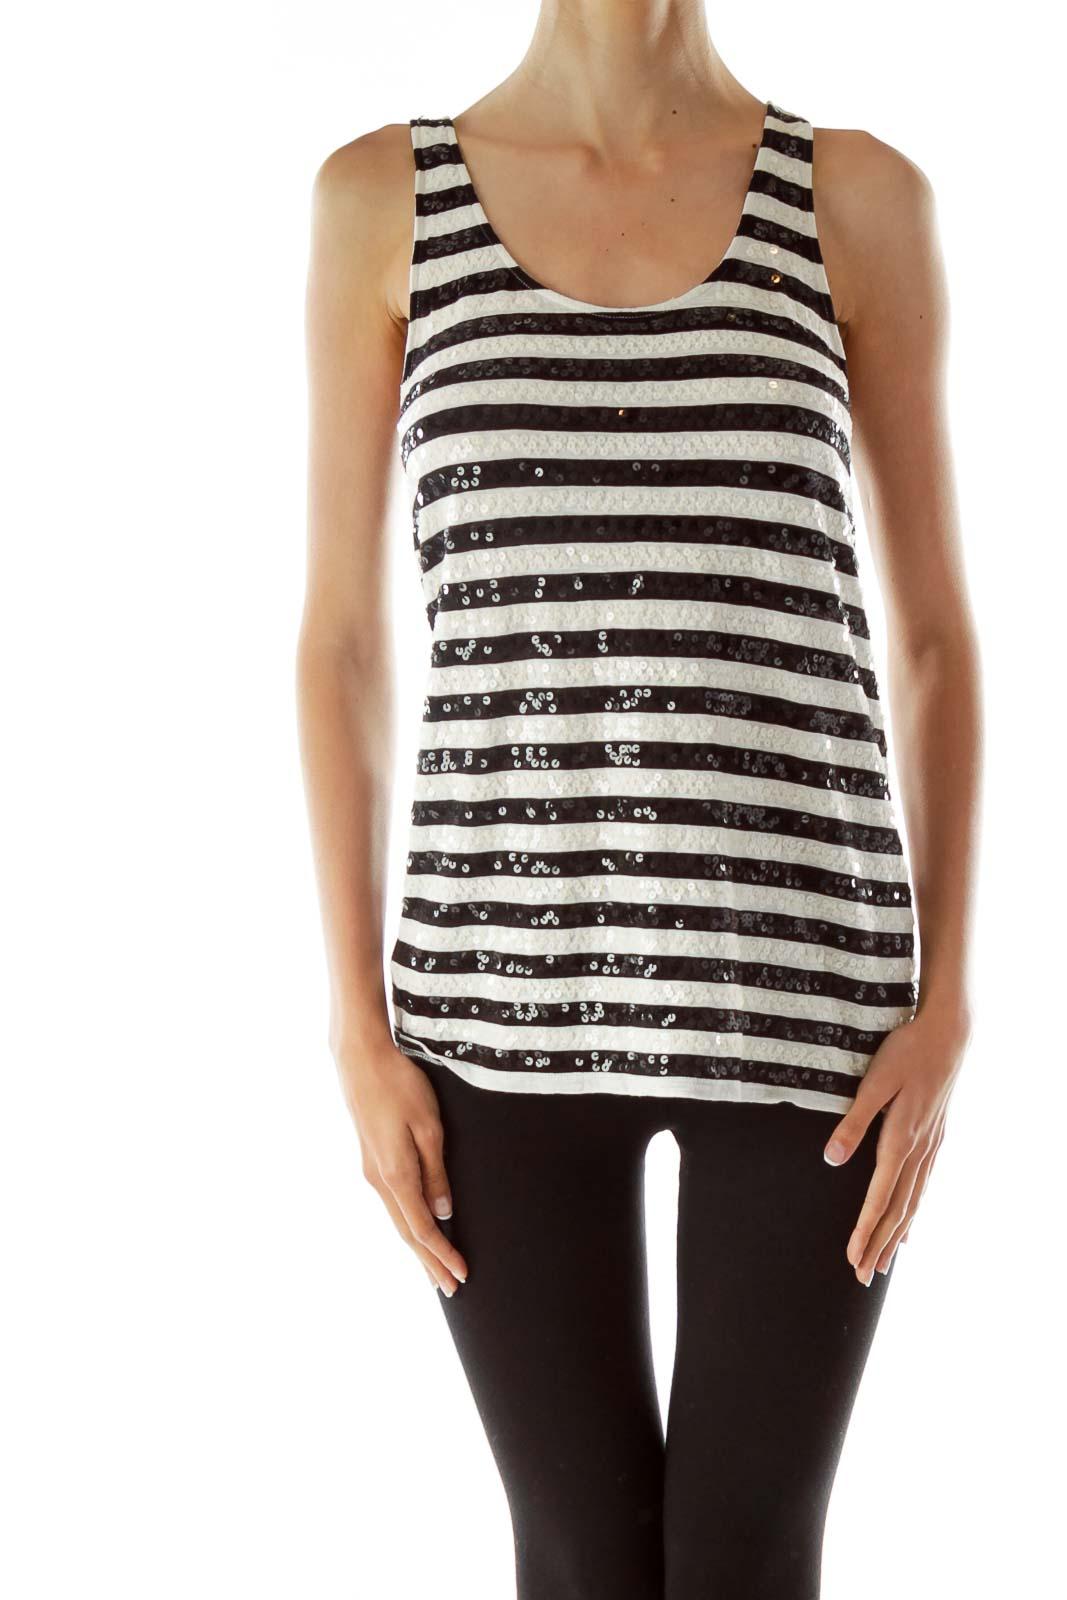 b8dbb72dd7ed84 Shop Black White Striped Sequined Tank Top clothing and handbags at ...